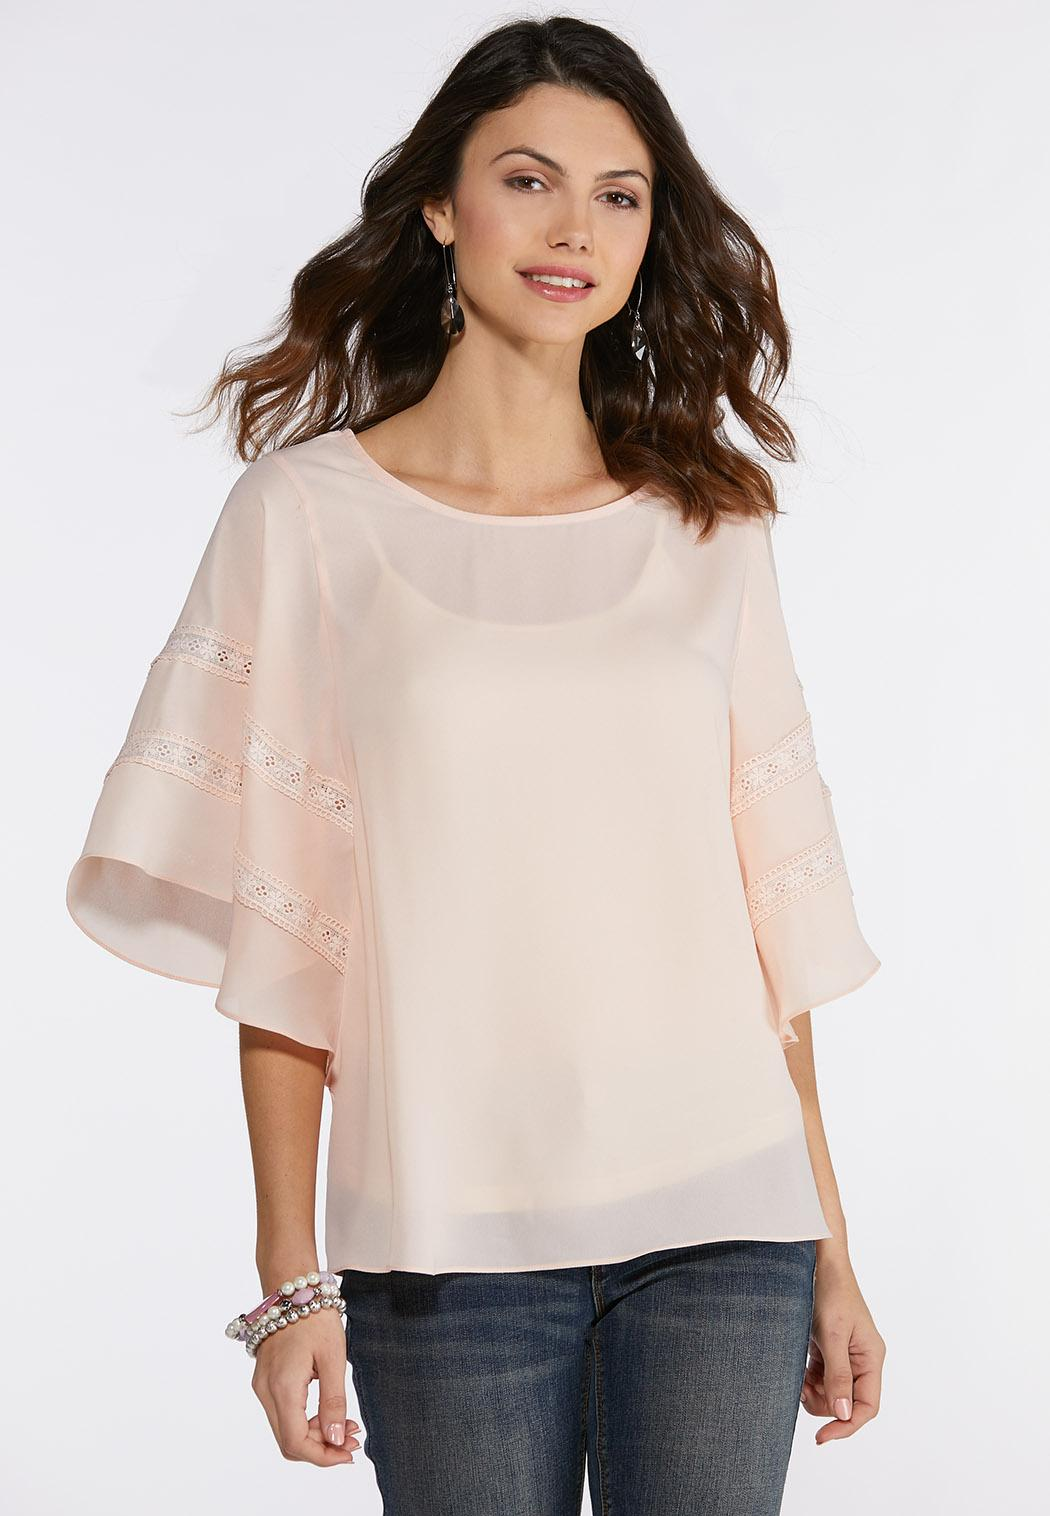 bdfda8d825d82 Blush Lace Trim Top Shirts   Blouses Cato Fashions